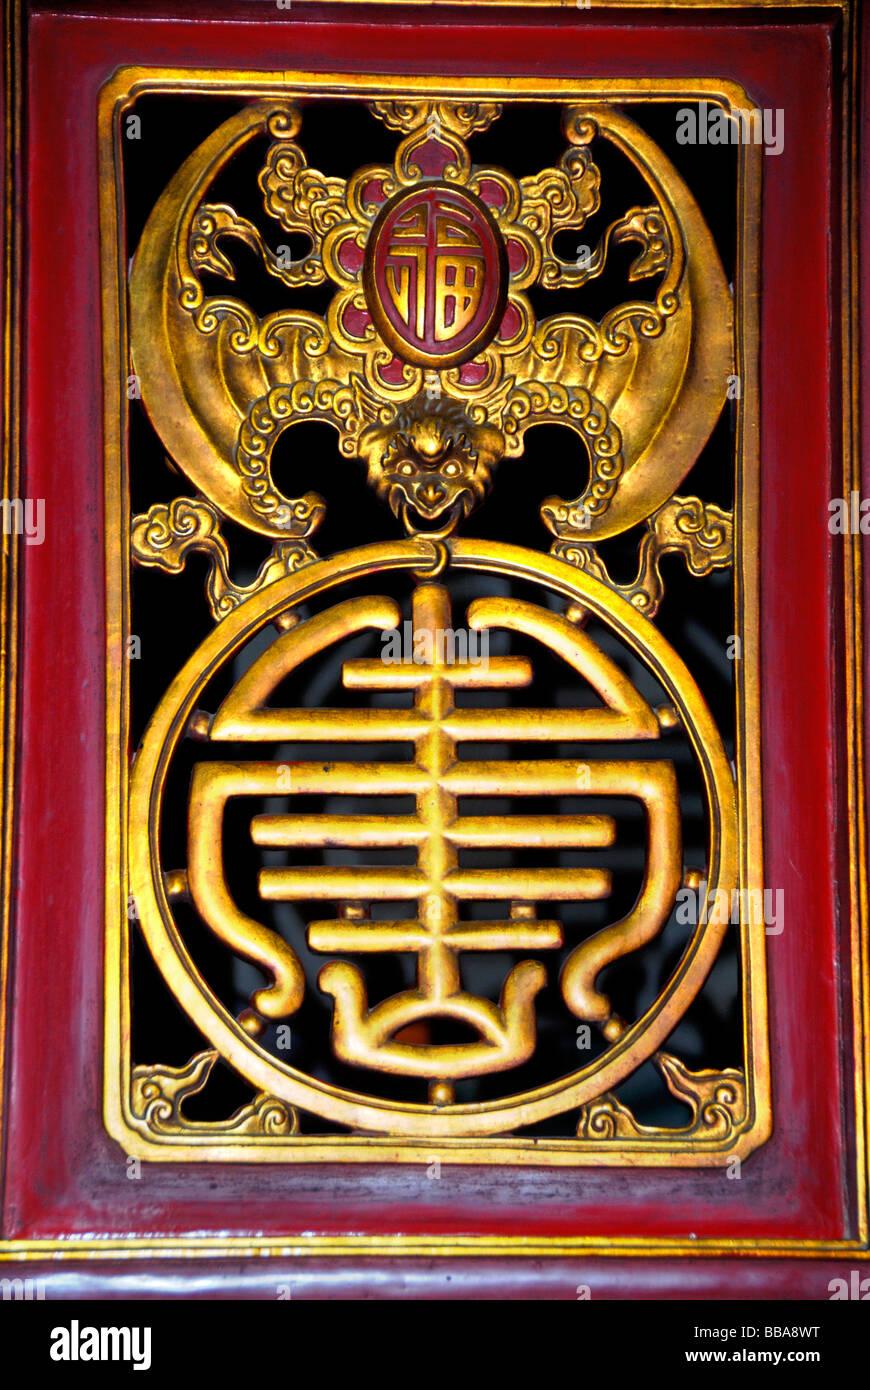 Buddhism, lettering as window decoration, Ngoc Son Temple, Hanoi, Vietnam, Southeast Asia, Asia - Stock Image